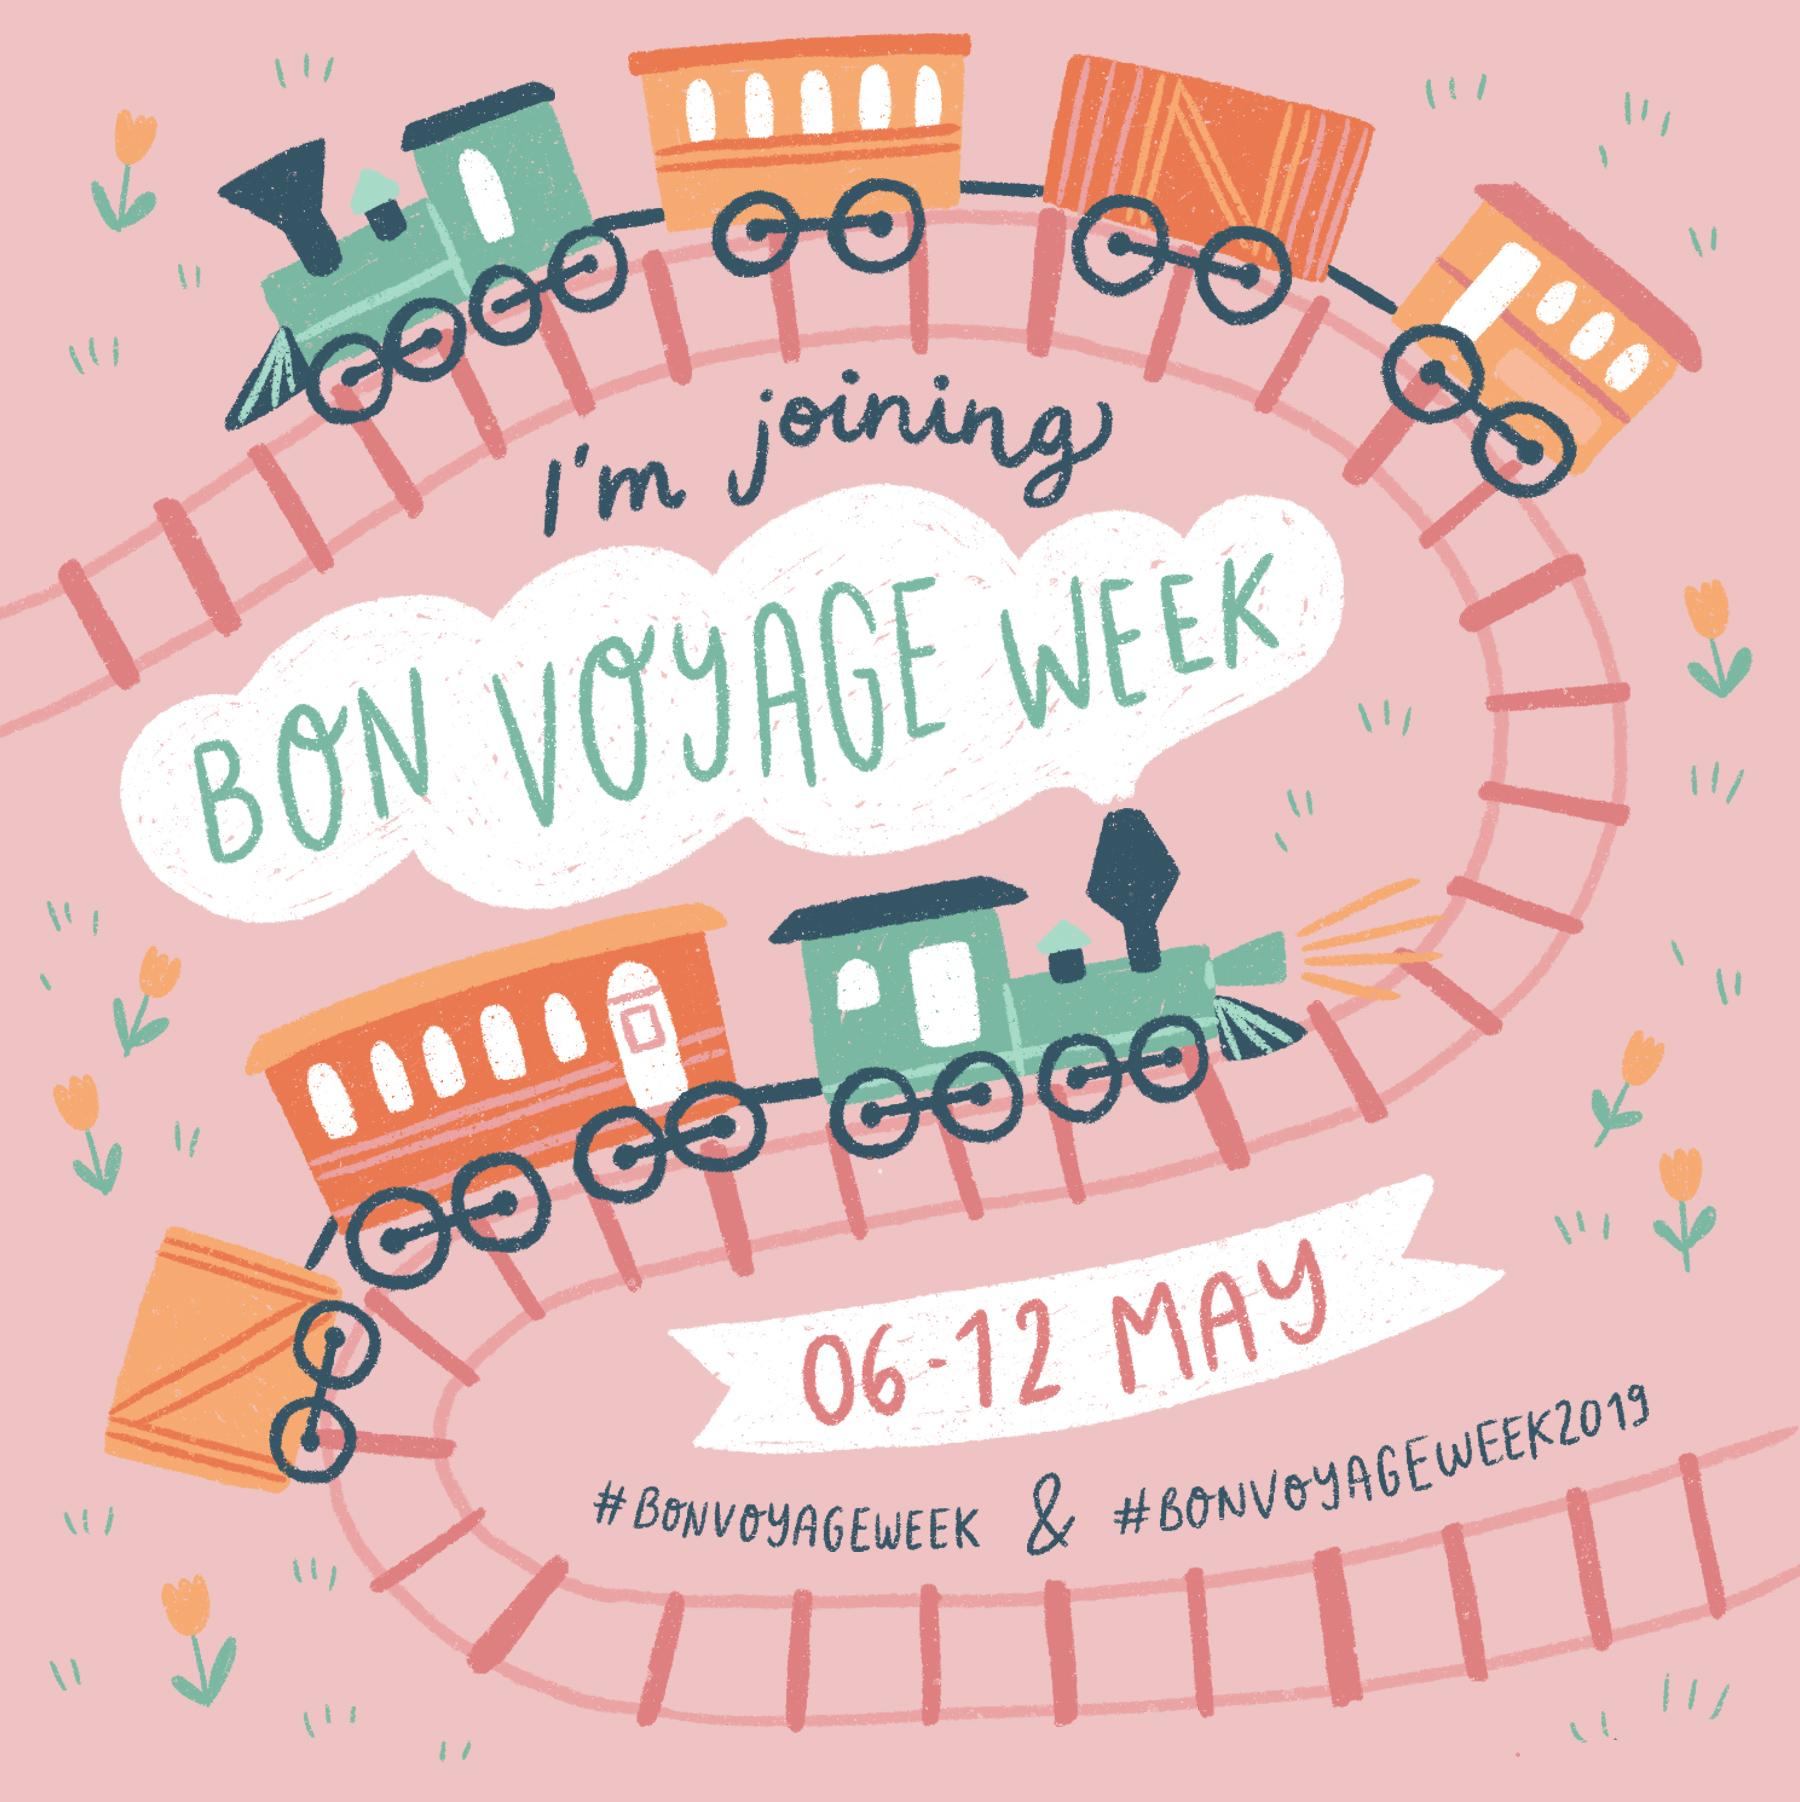 Carole_Chevalier-Bon_Voyage_Week-1.jpg